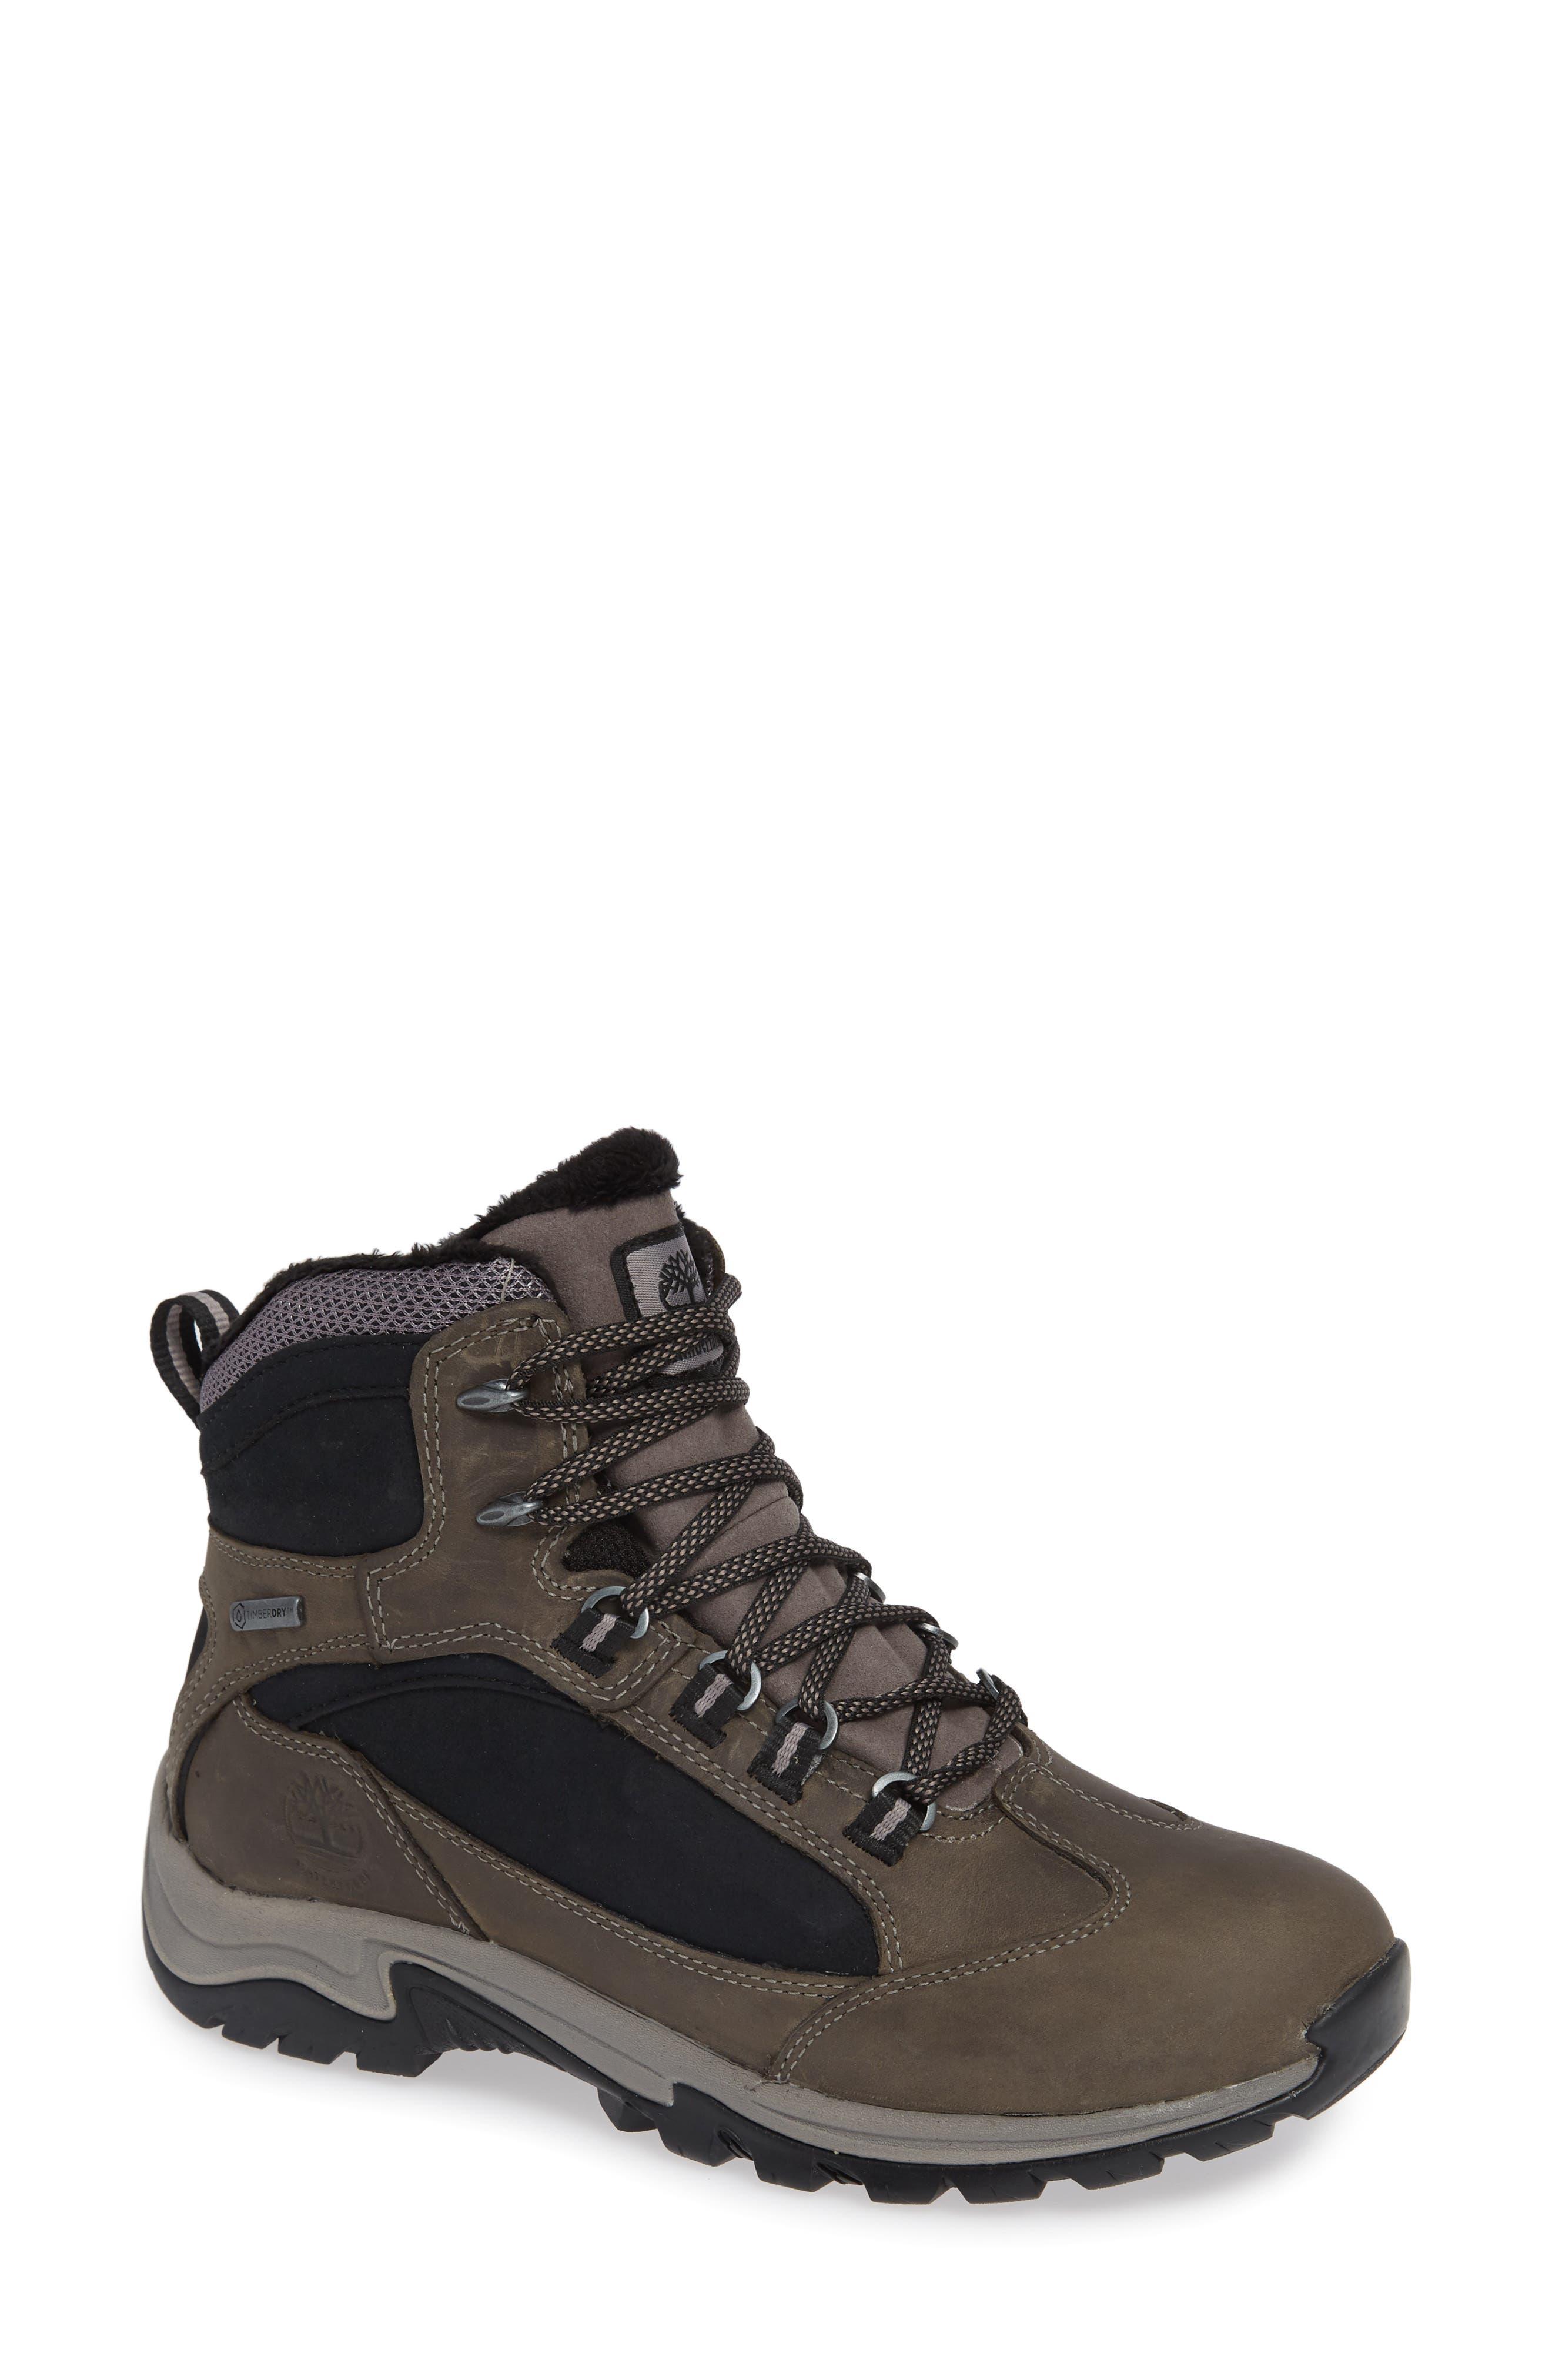 Mt. Maddsen Waterproof Winter Boot,                             Main thumbnail 1, color,                             030